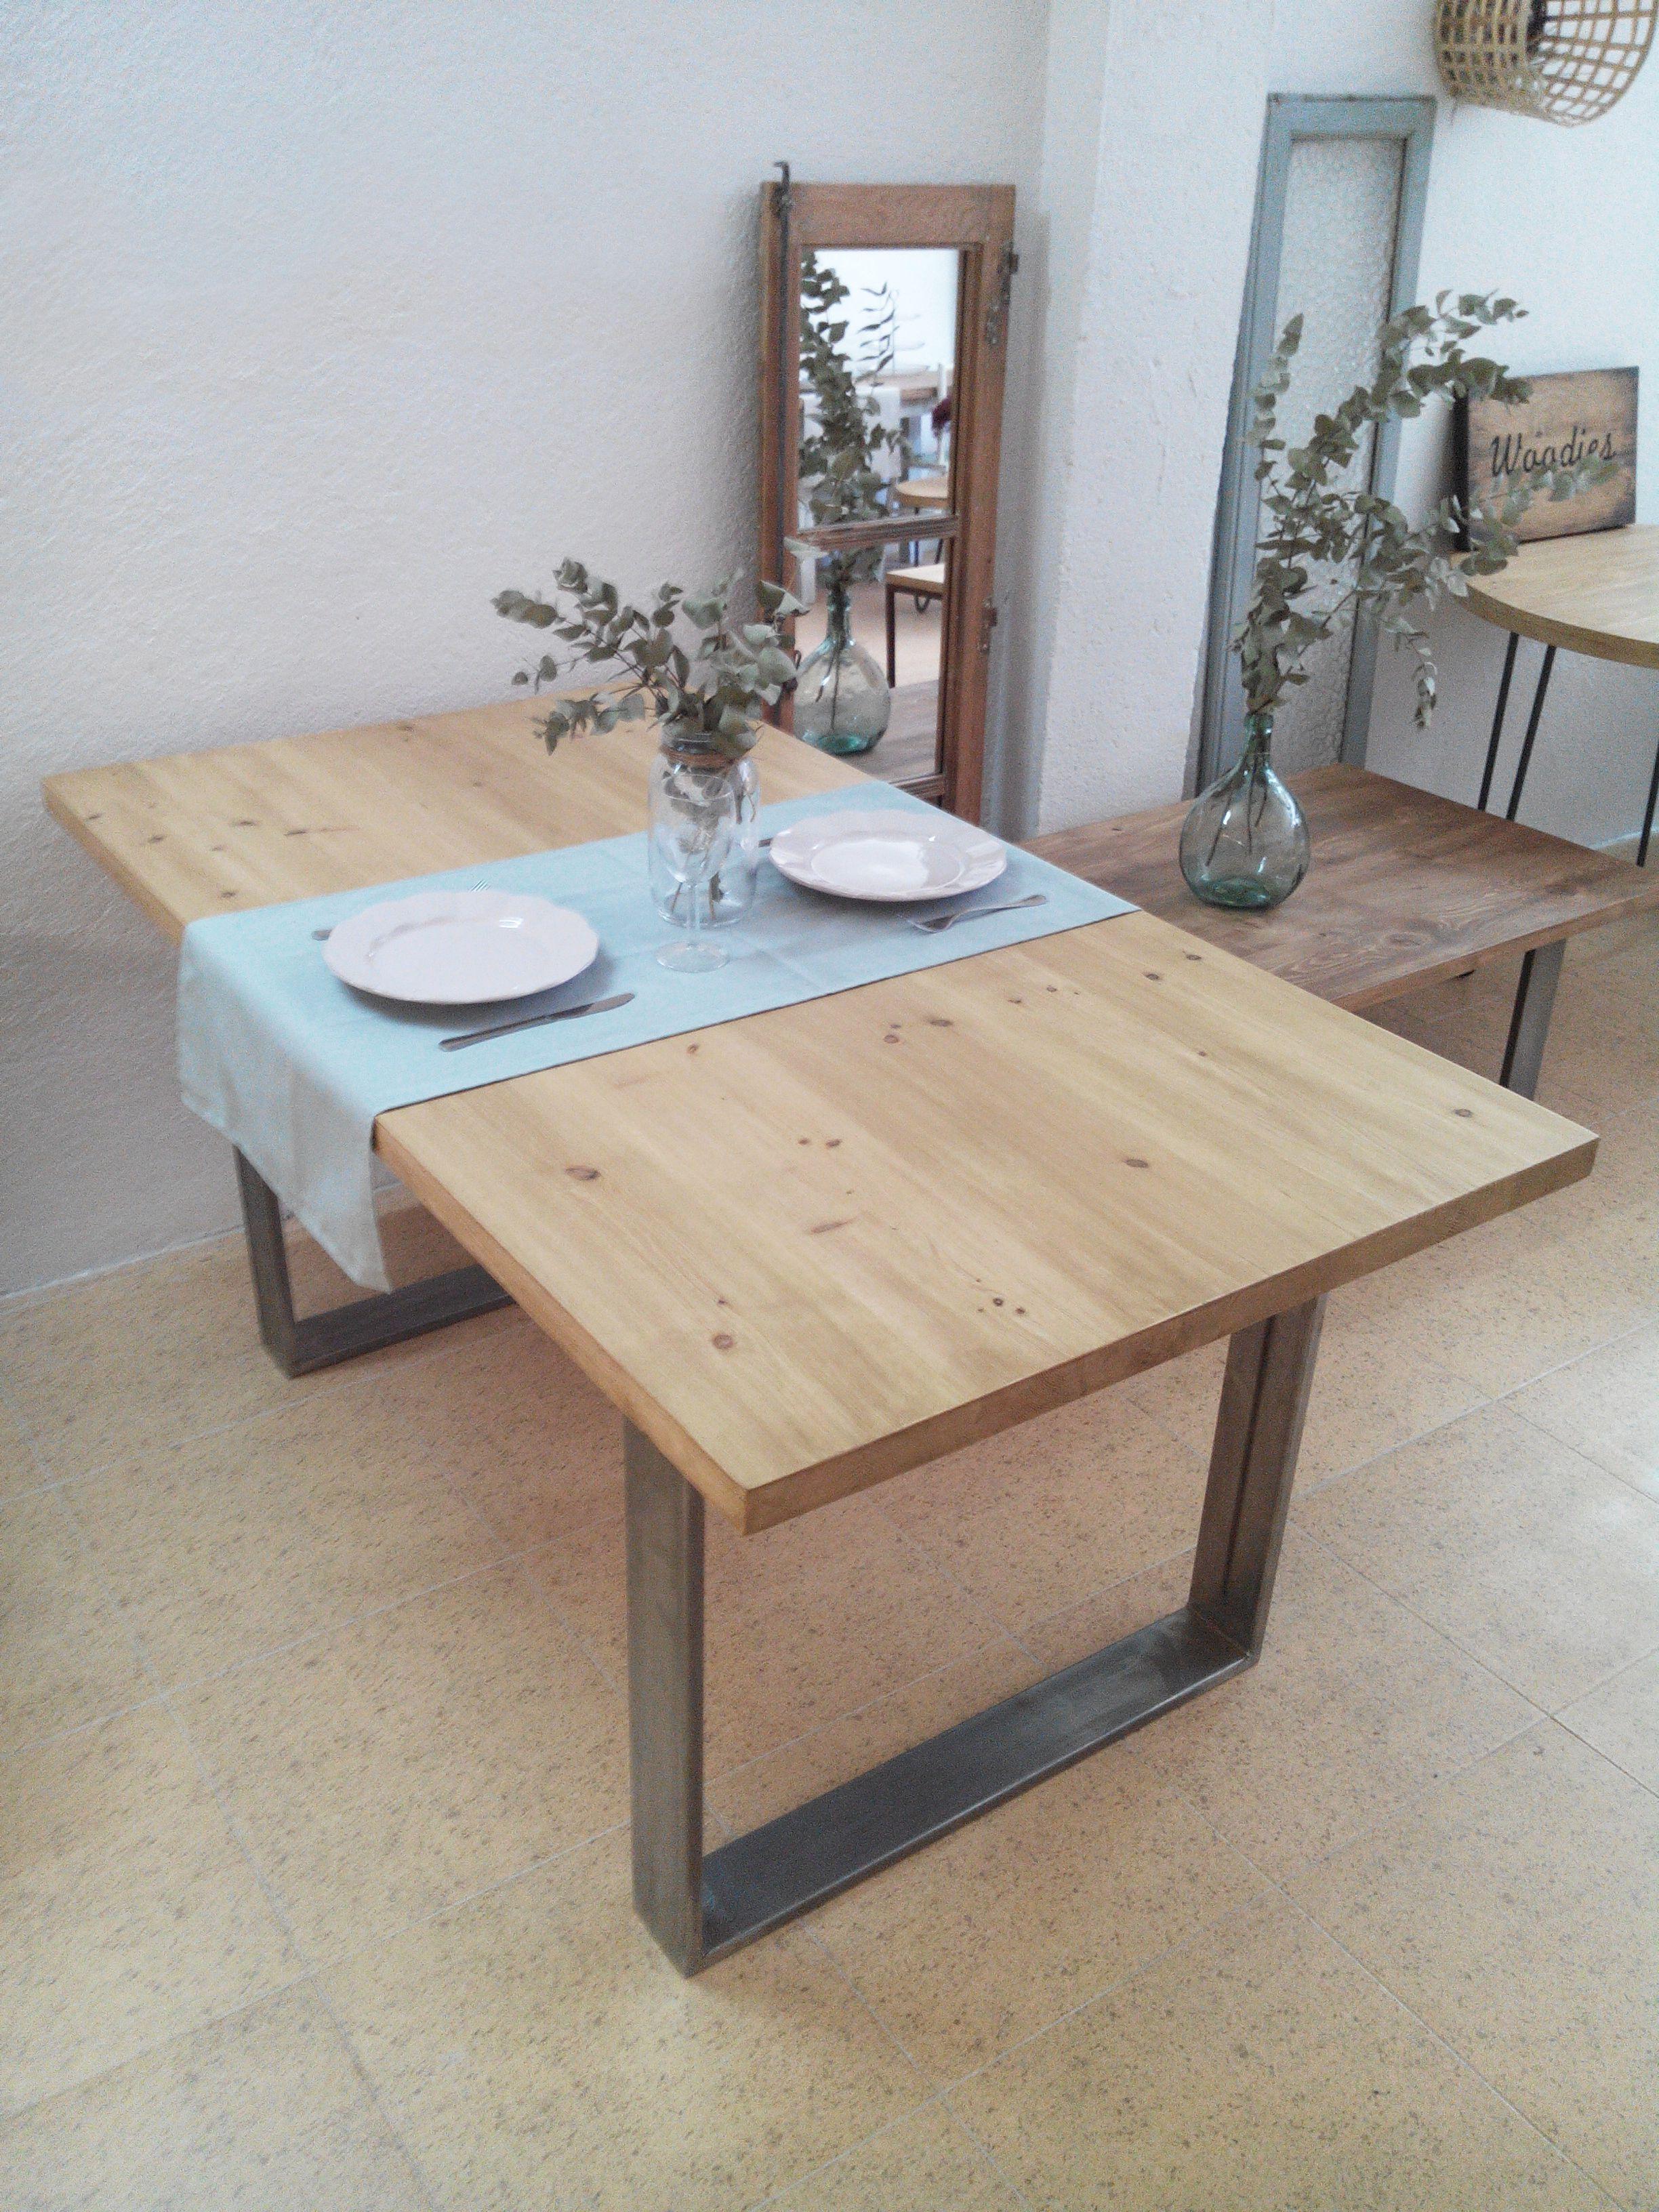 Mesa de comedor industrial mesa de comedor hecha con - Muebles de madera natural ...